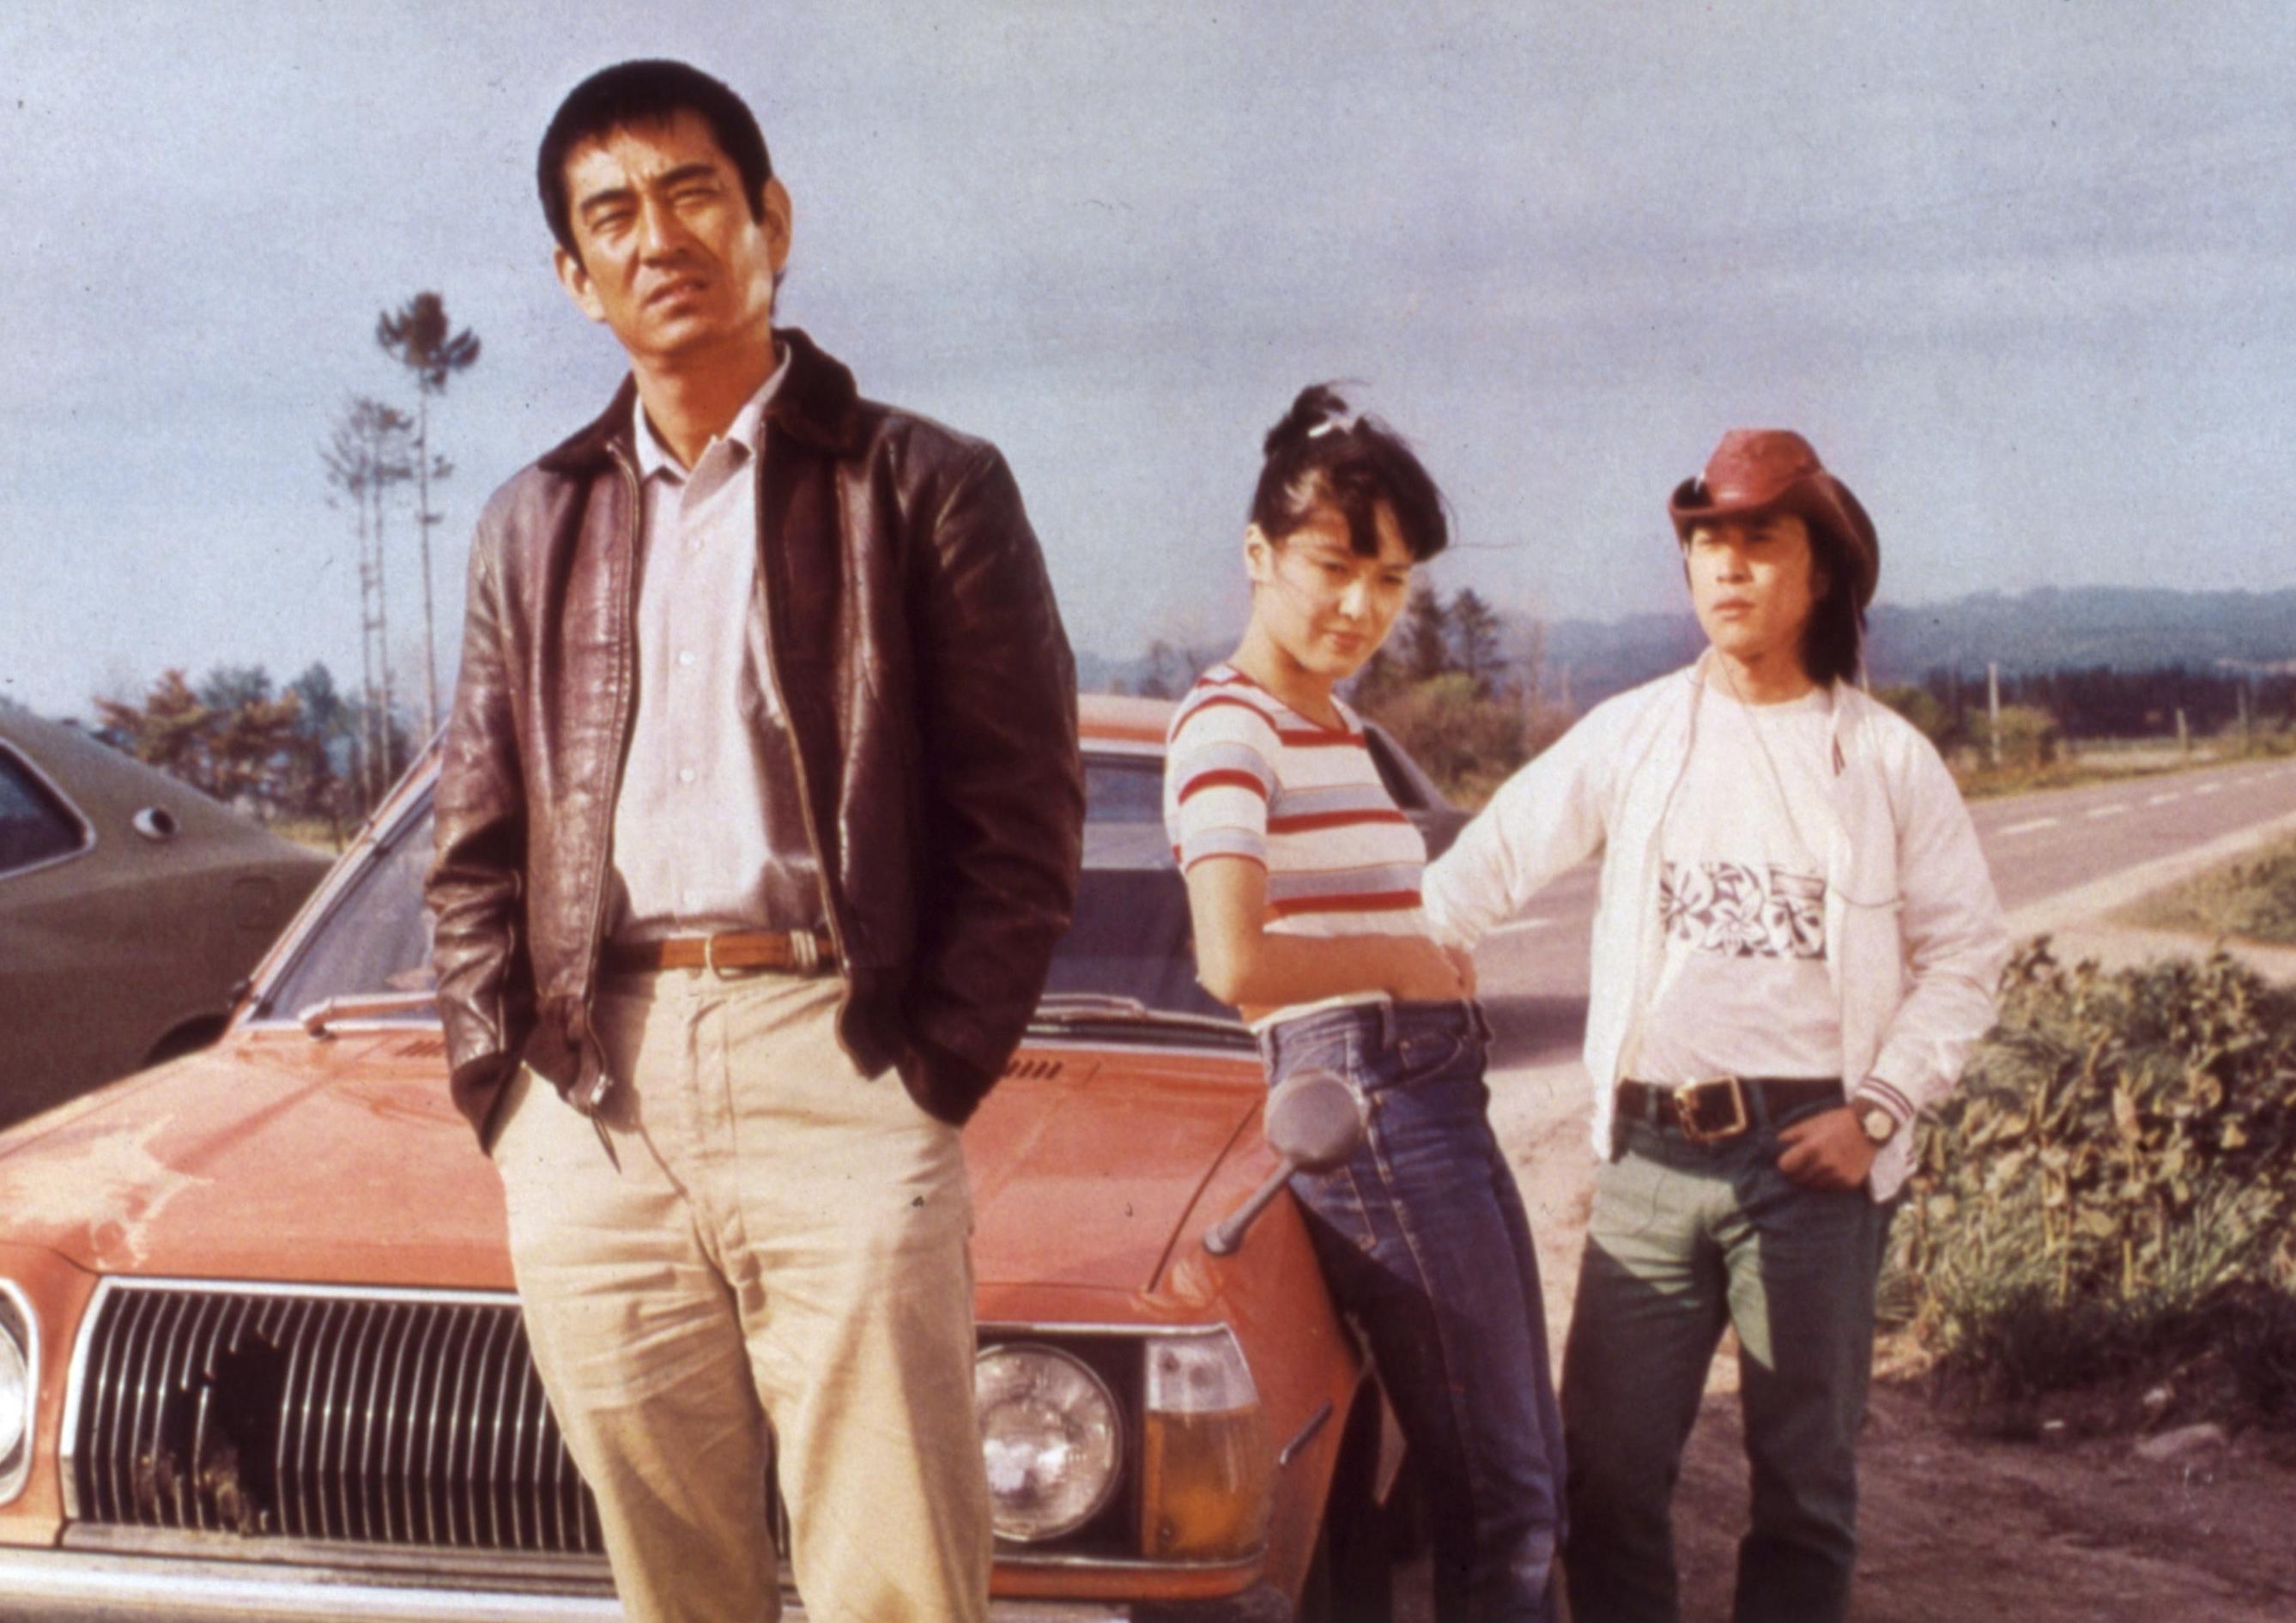 The Yellow Handkerchief Ken Takakura